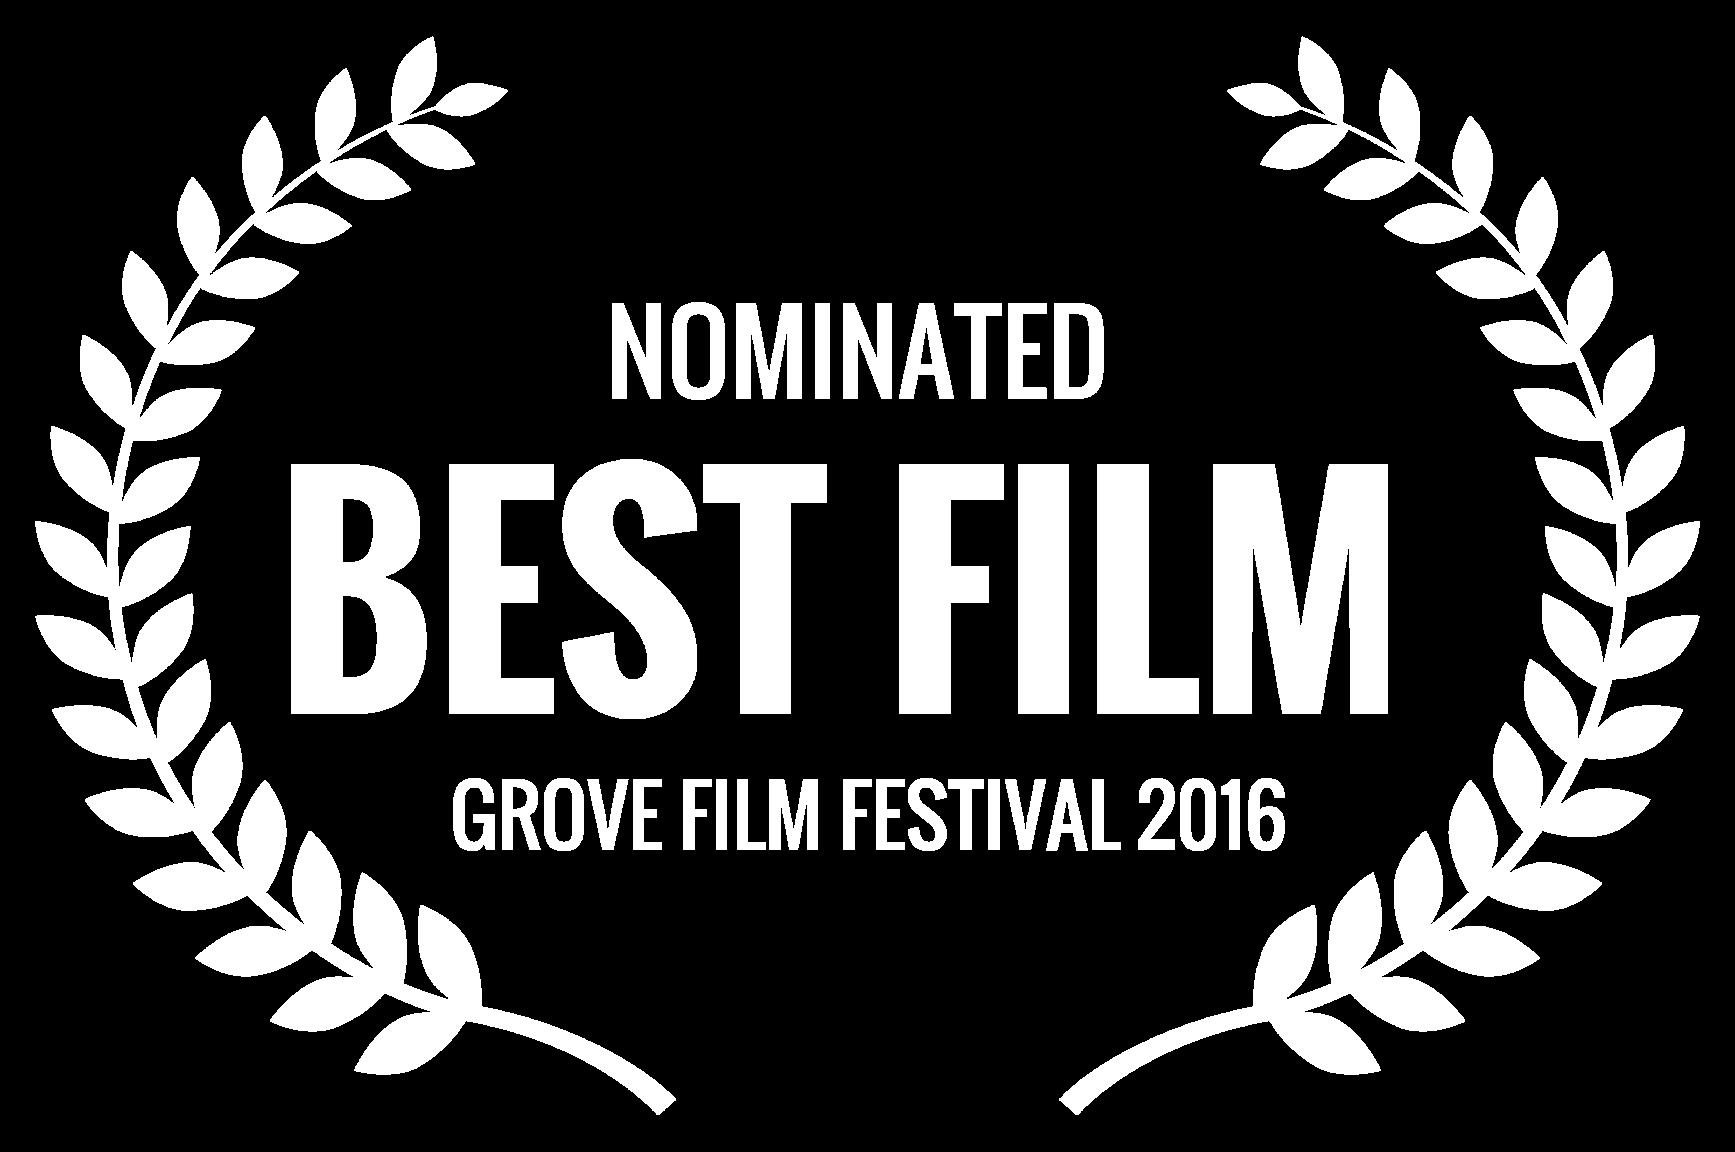 NOMINATED  - BEST FILM  - GROVE FILM FESTIVAL 2016.png